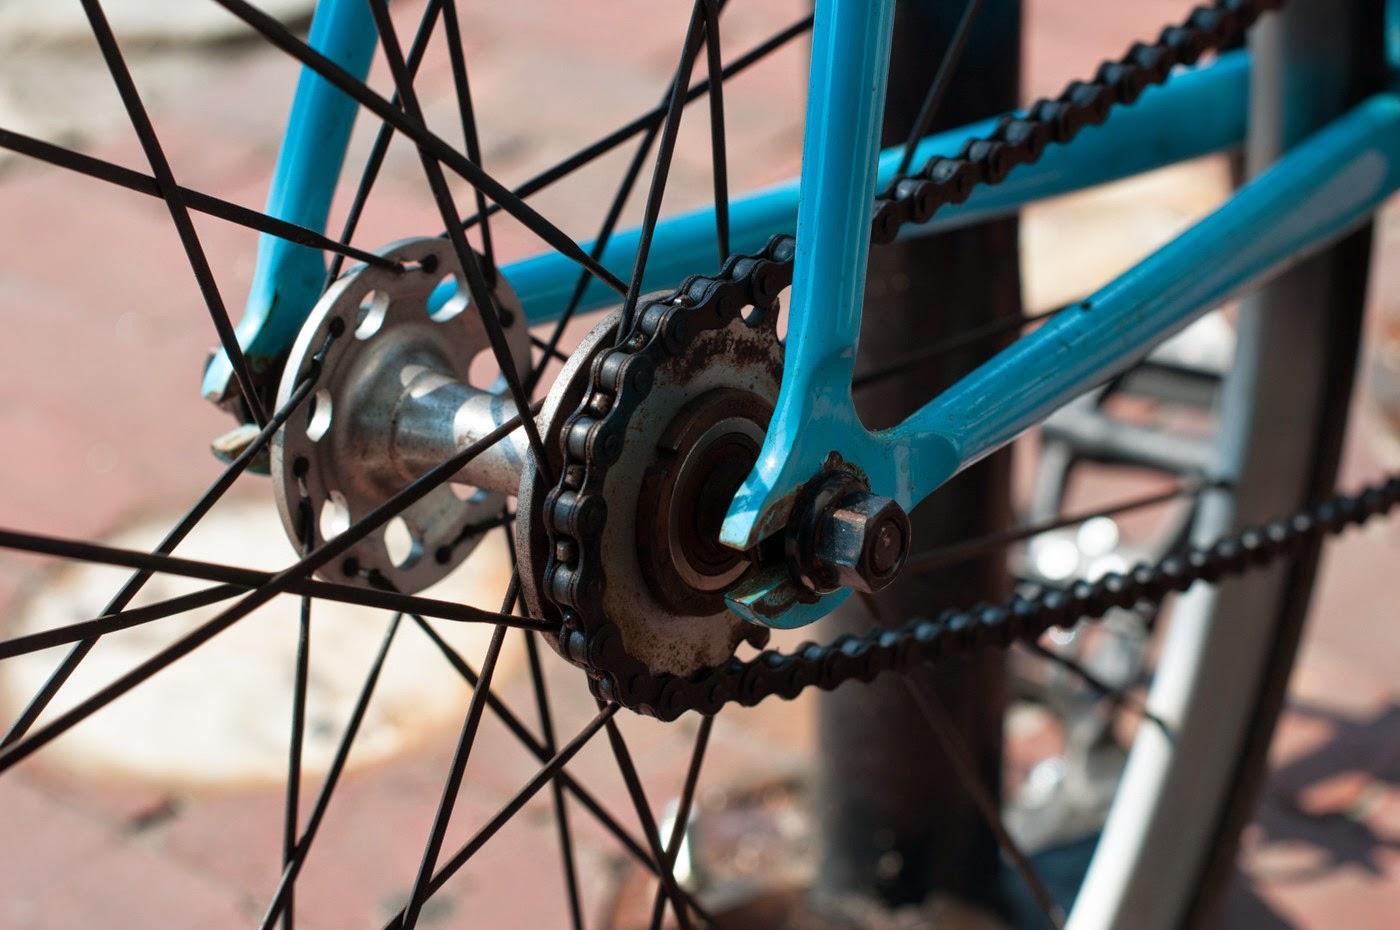 Fixie, fixed speed, bicycle, boston, USA, custom, customised, blue, tim Macauley, the biketorialist, shimano, frame, 3t, ritchey, tiagra , cog